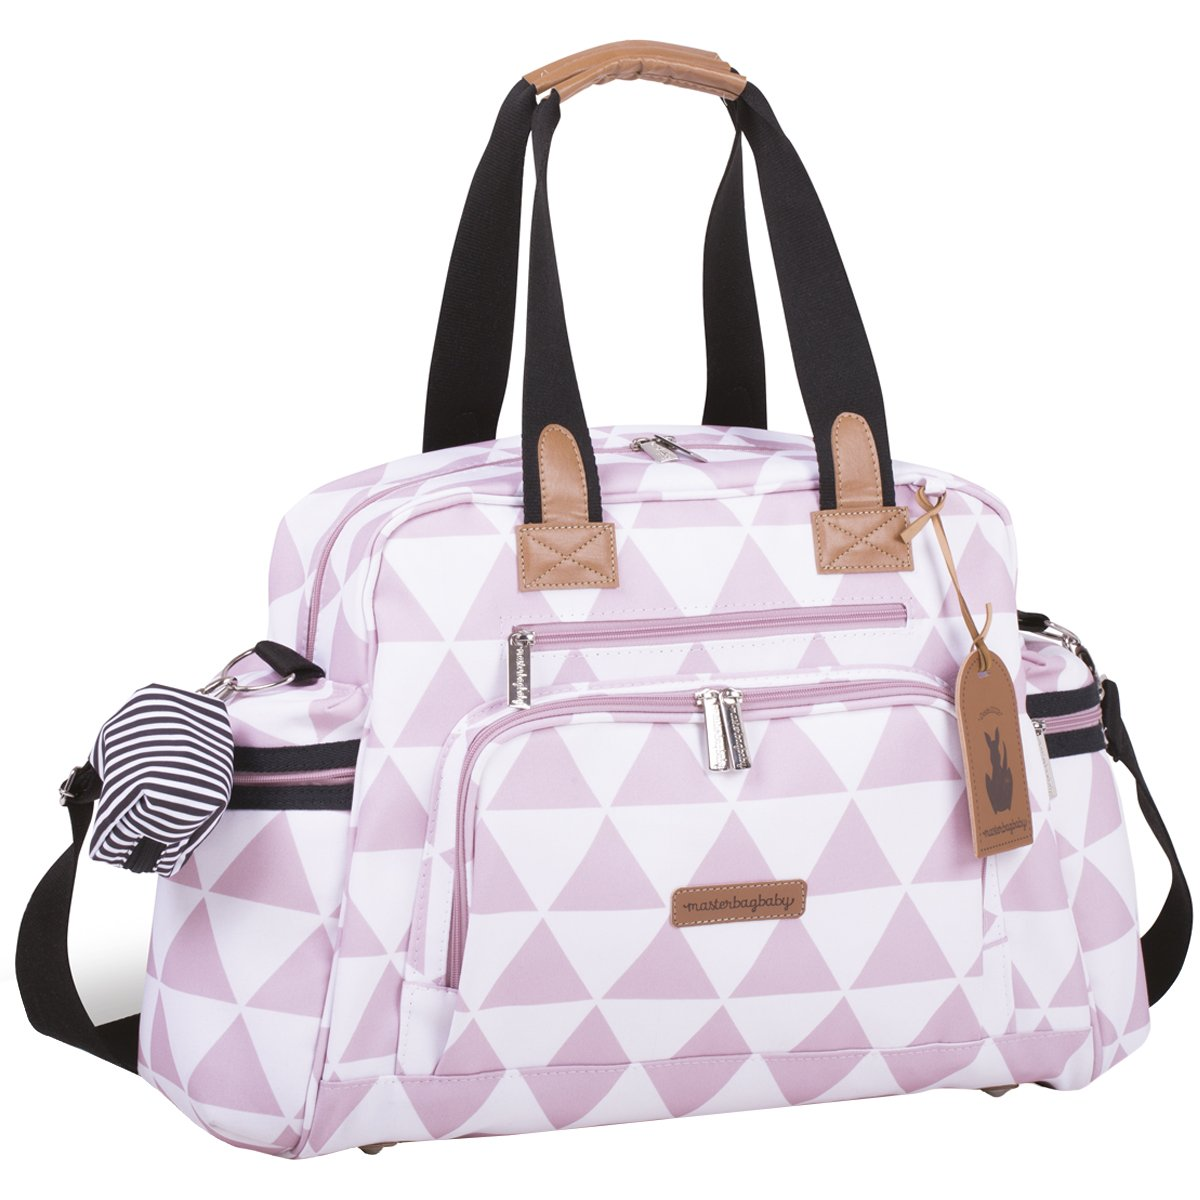 Bolsa Maternidade Everyday Manhattan Masterbag | Cor: Rose